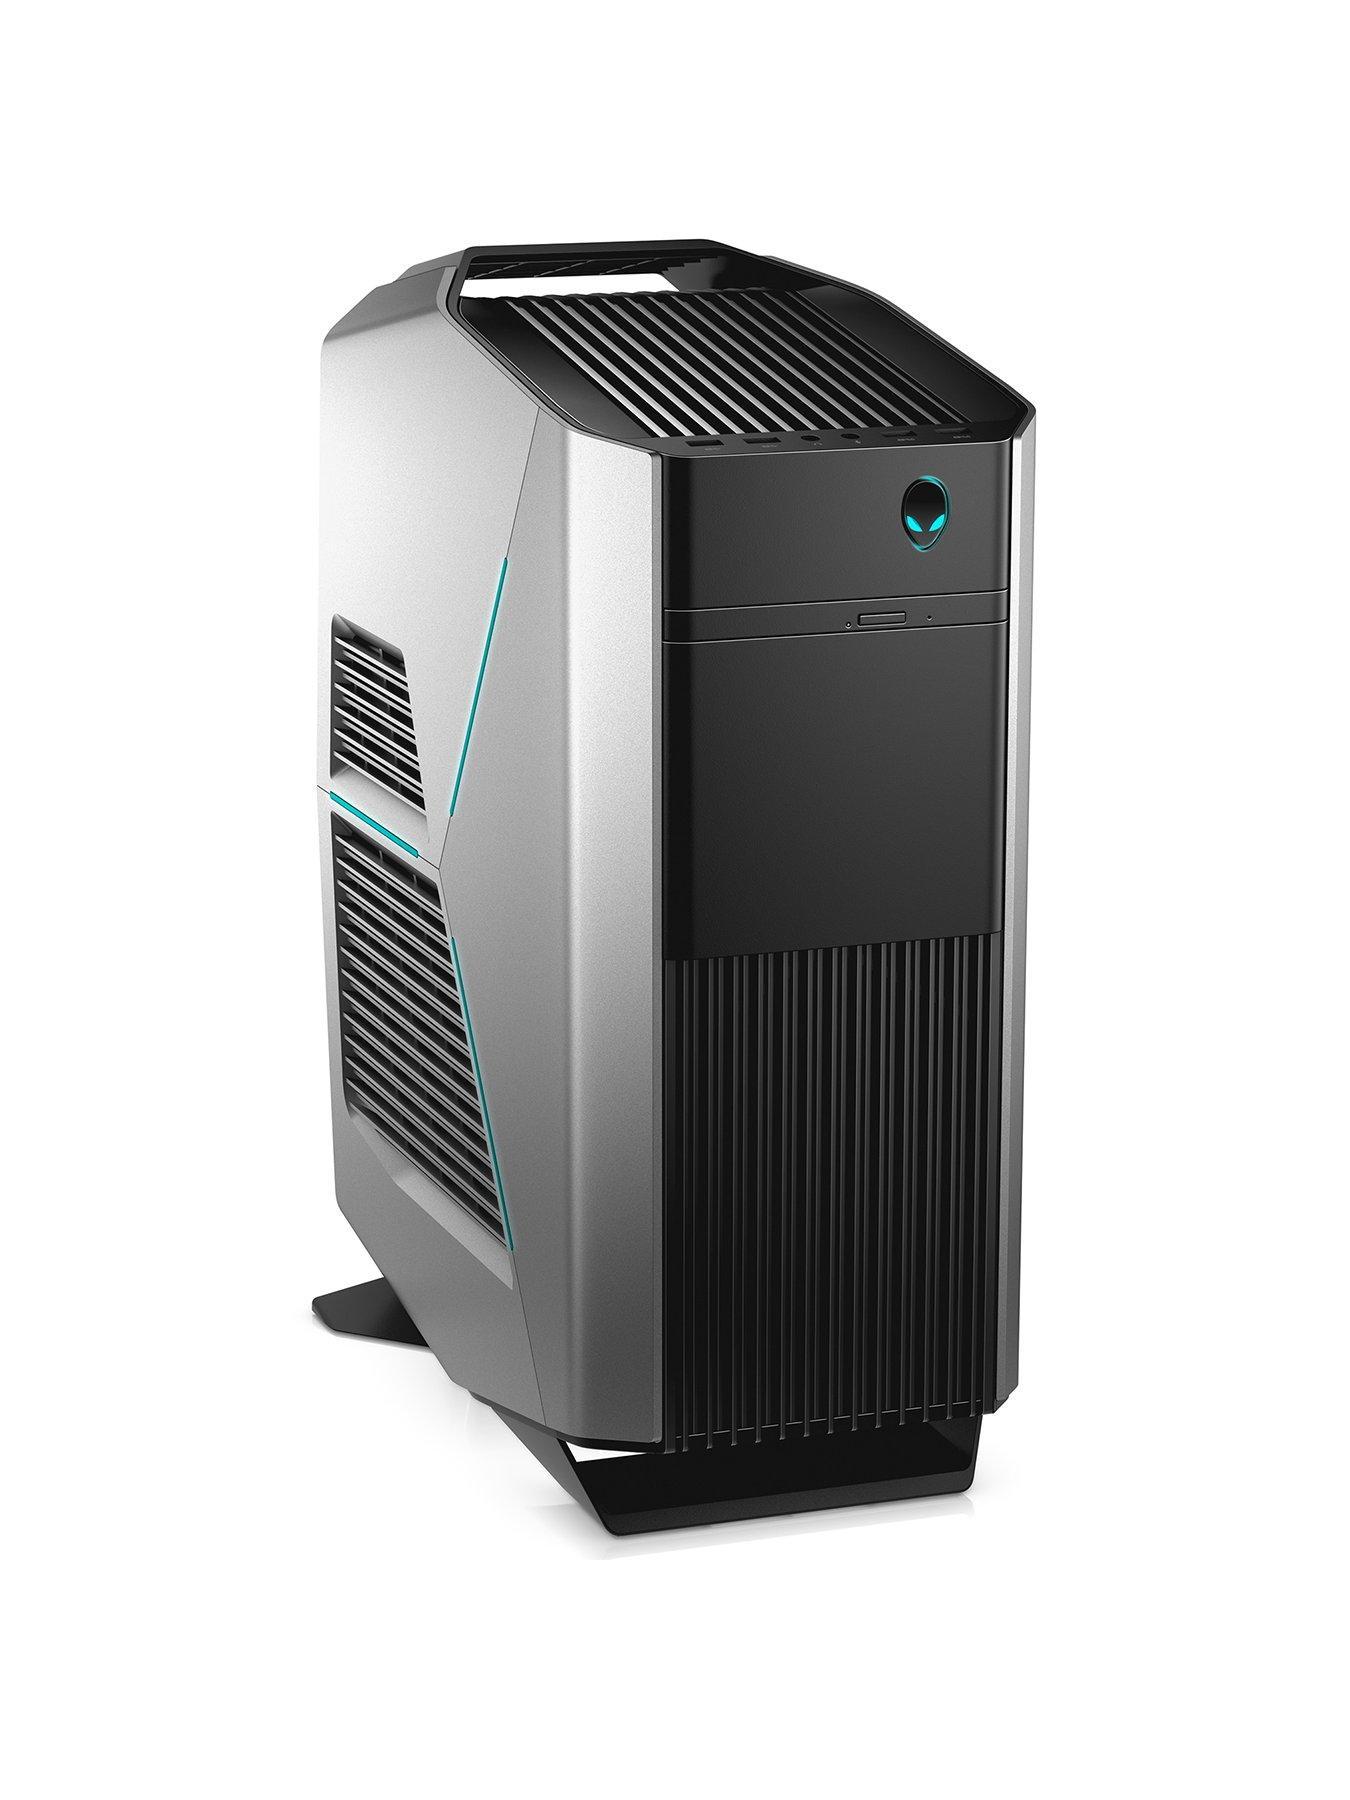 Alienware Aurora R7, Intel® Core™ i7-8700 Processor, 16GbDDR4 RAM, 2TbHDD & 32GbIntel® Optane™, Gaming PC with 8GbNVIDIA GeForce GTX 1080 Graphics